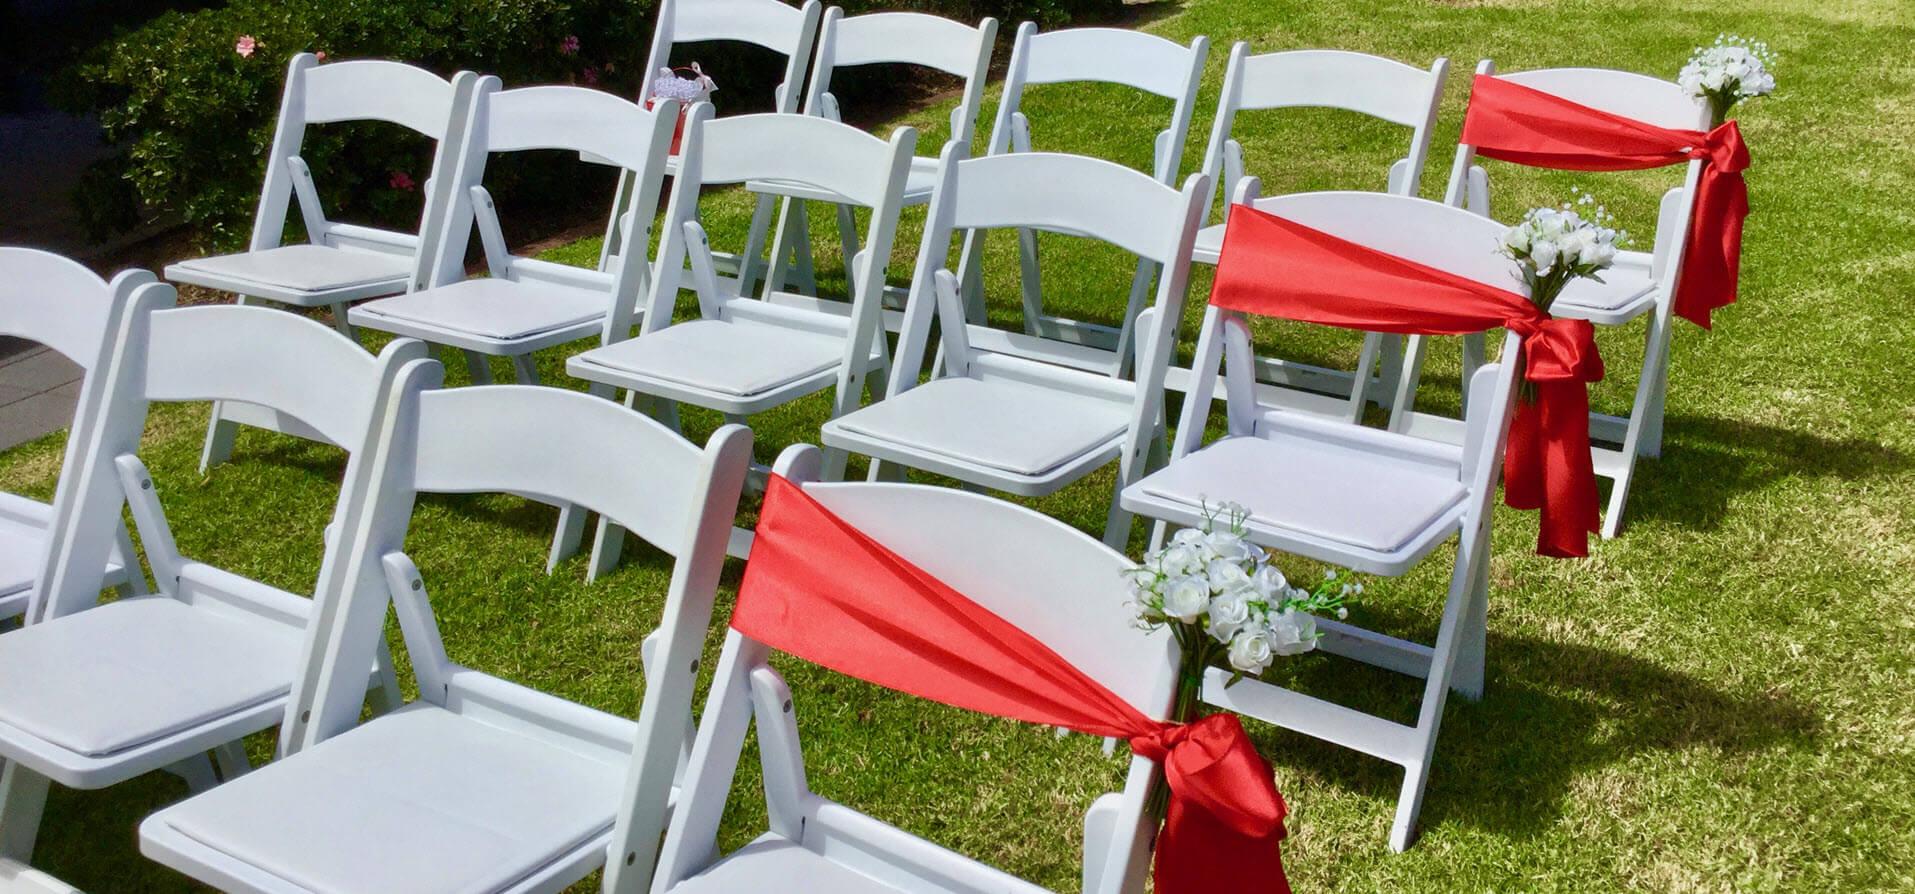 Morag john stylish outdoor weddings no 1 wedding hire in illawarra and wollongong